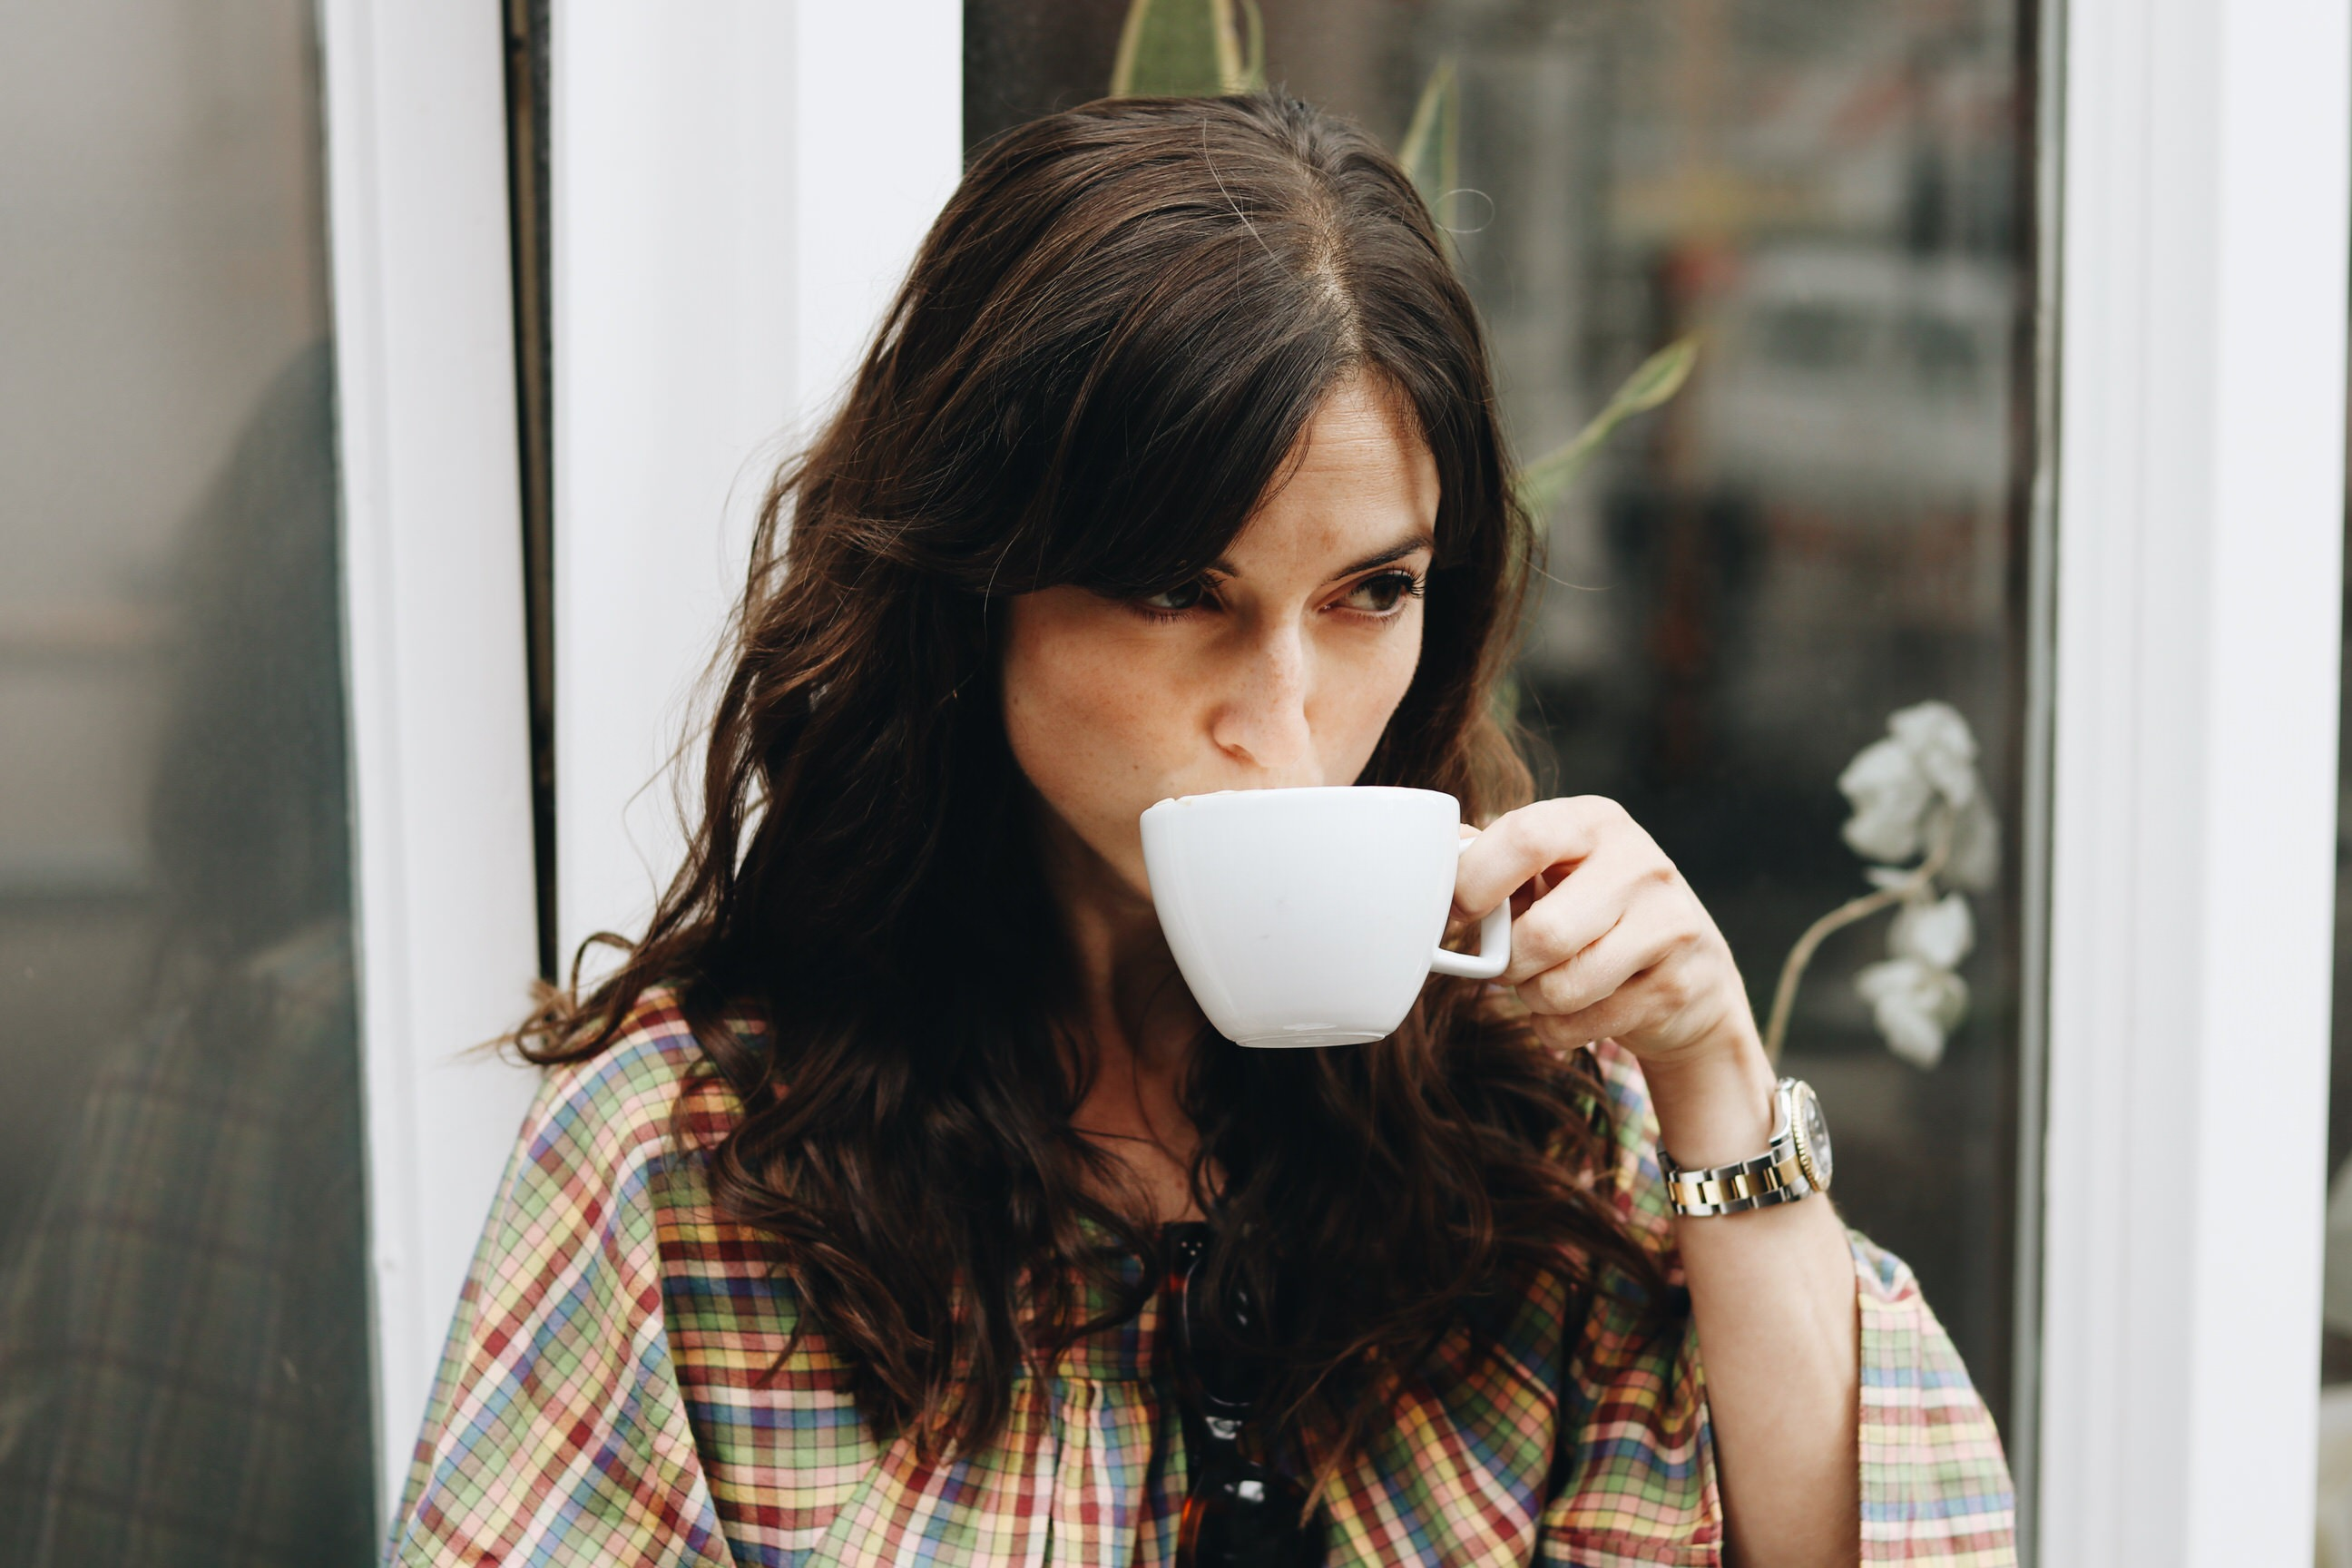 Neele Modebloggerin Freiburg Kaffee Sommer Outfit Kleid nachhaltig fair fashion